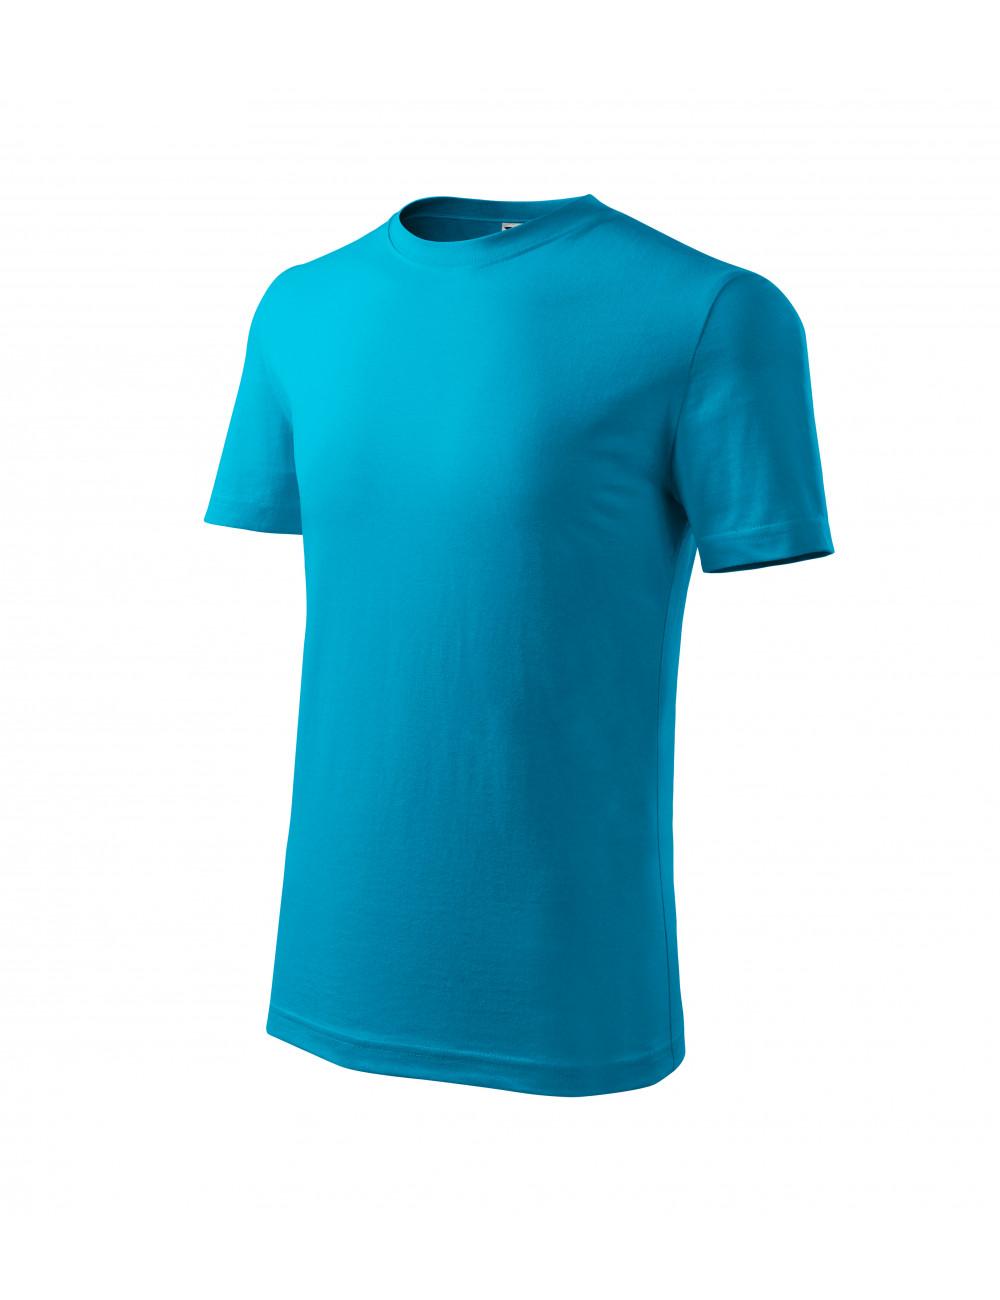 Adler MALFINI Koszulka dziecięca Classic New 135 turkus